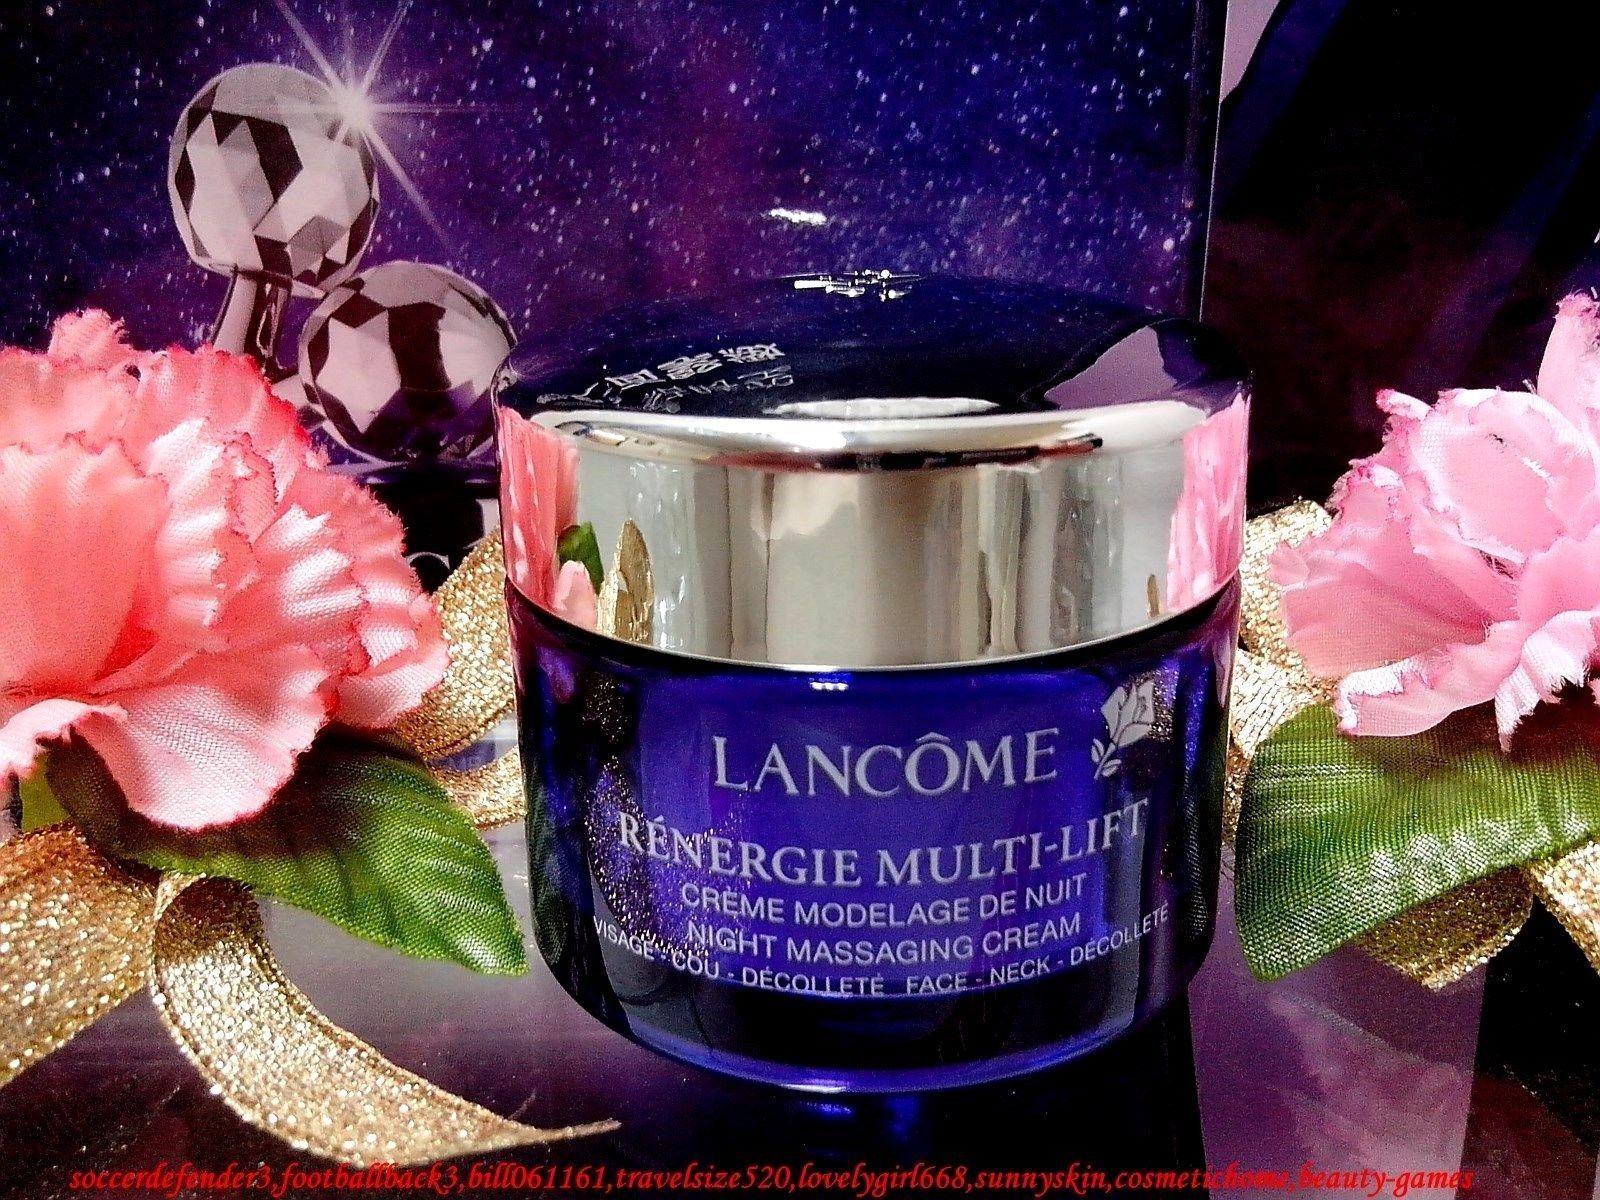 Renergie Multi-Lift Redefining Lifting Cream SPF15 by Lancôme #8